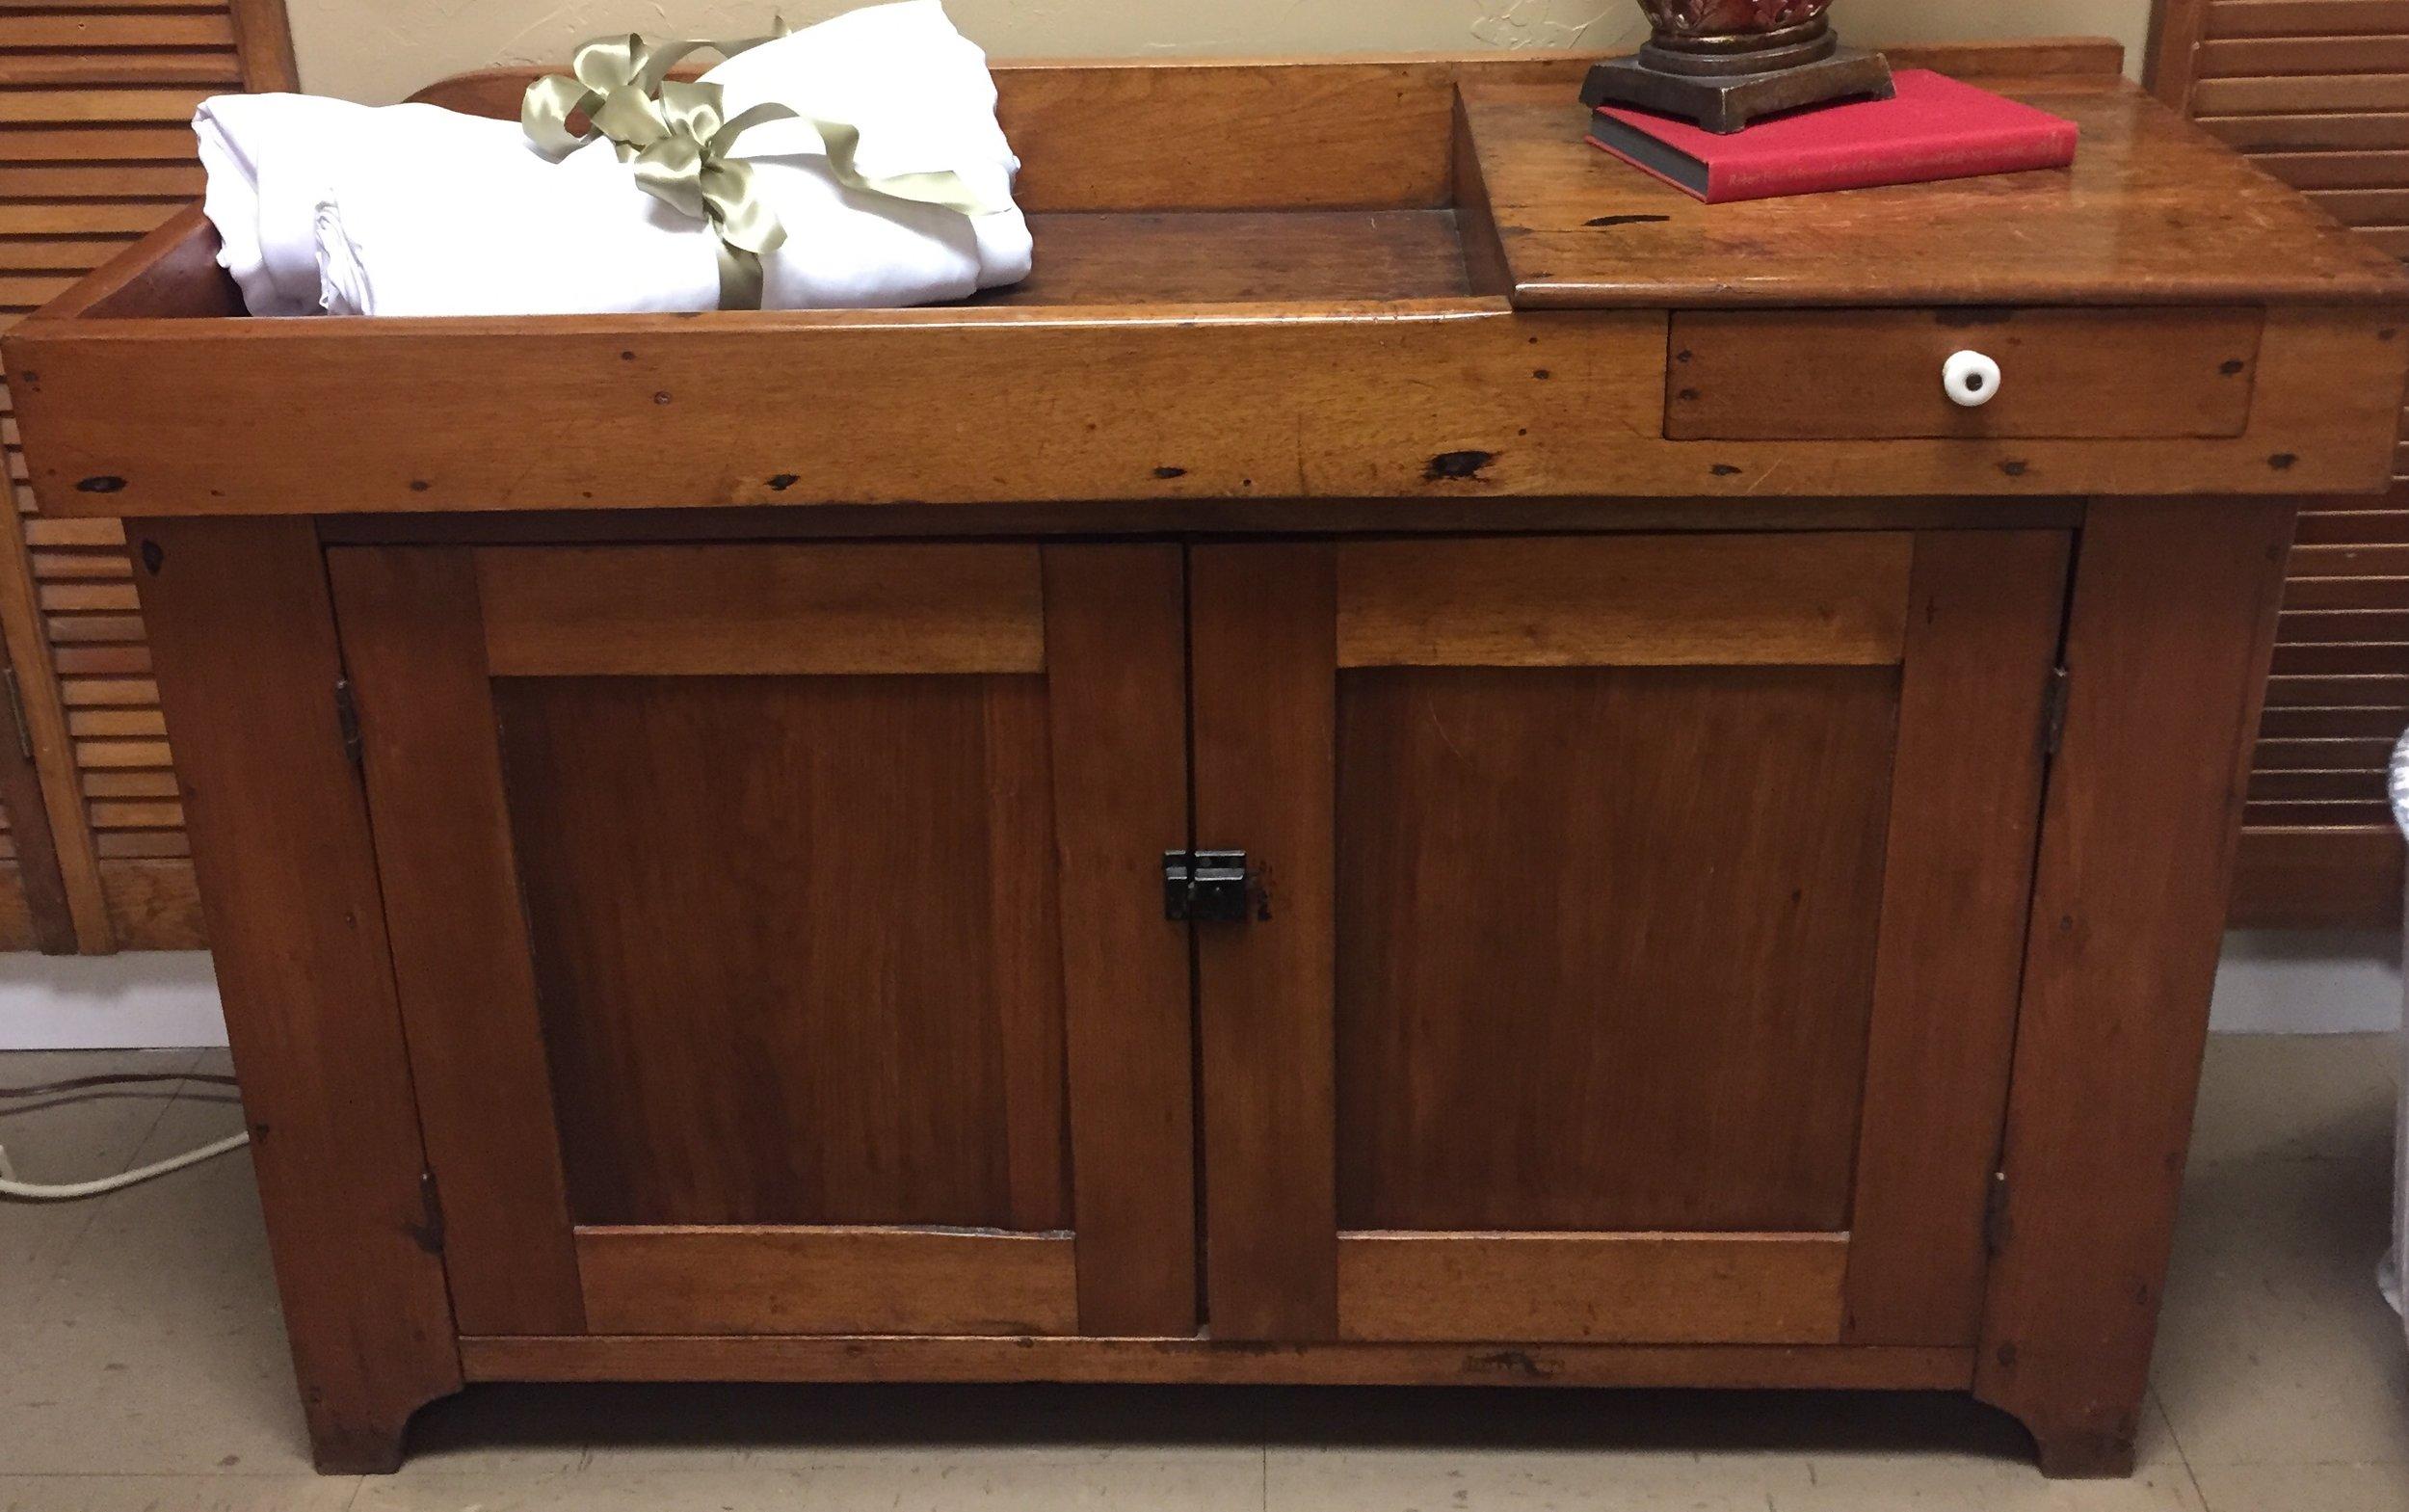 Dry Sink $299.95 - C1043 22921